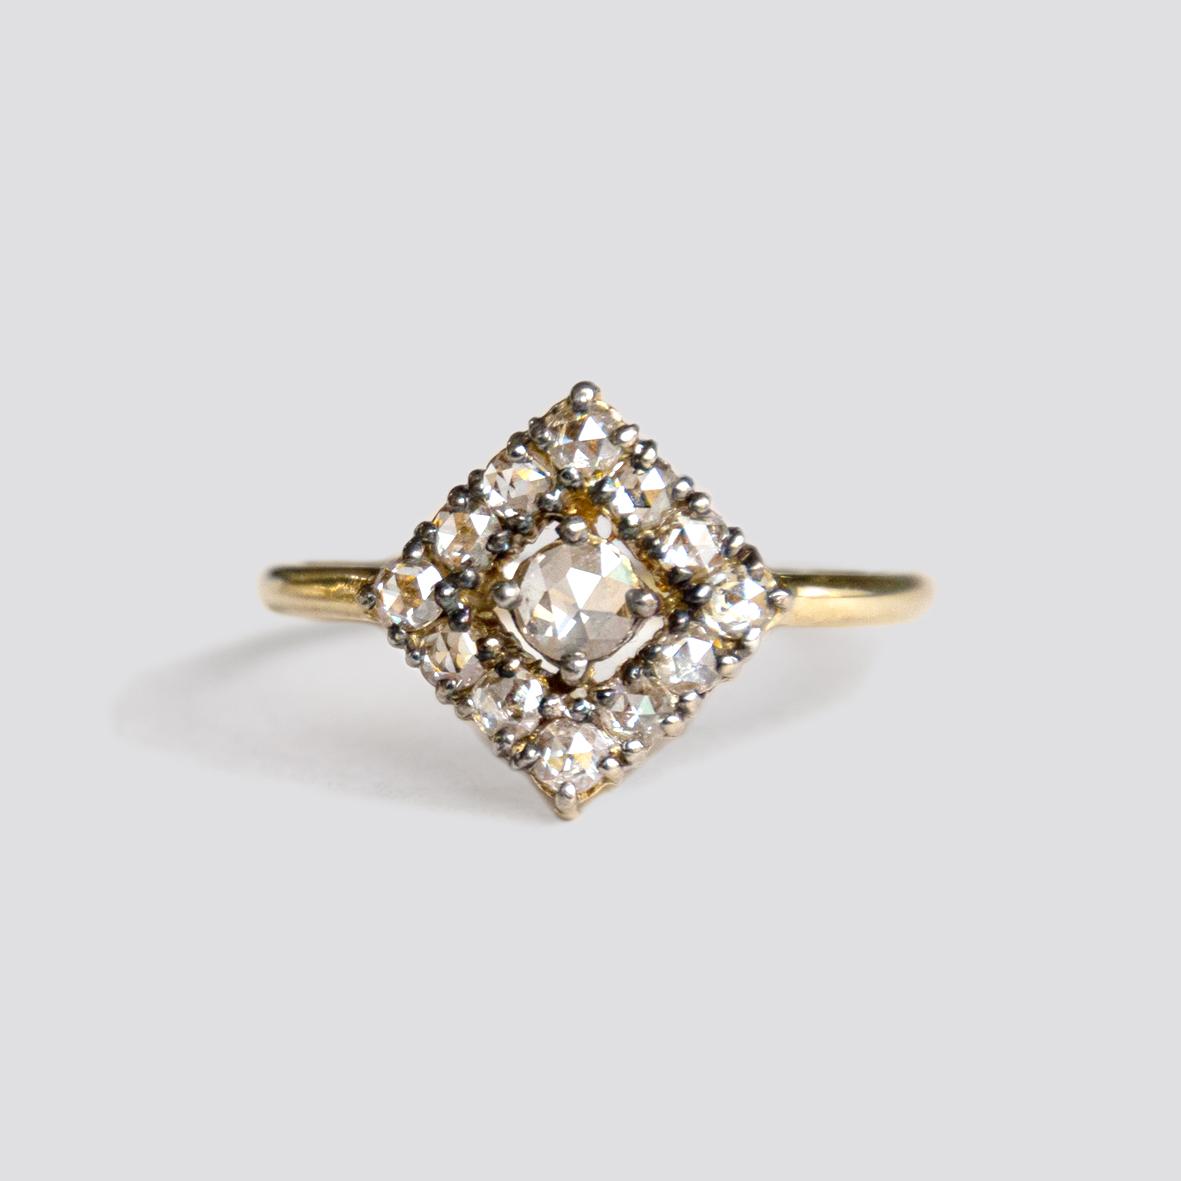 1. OONA__lotus_ficha 1_rhomb rose-cut diamond ring